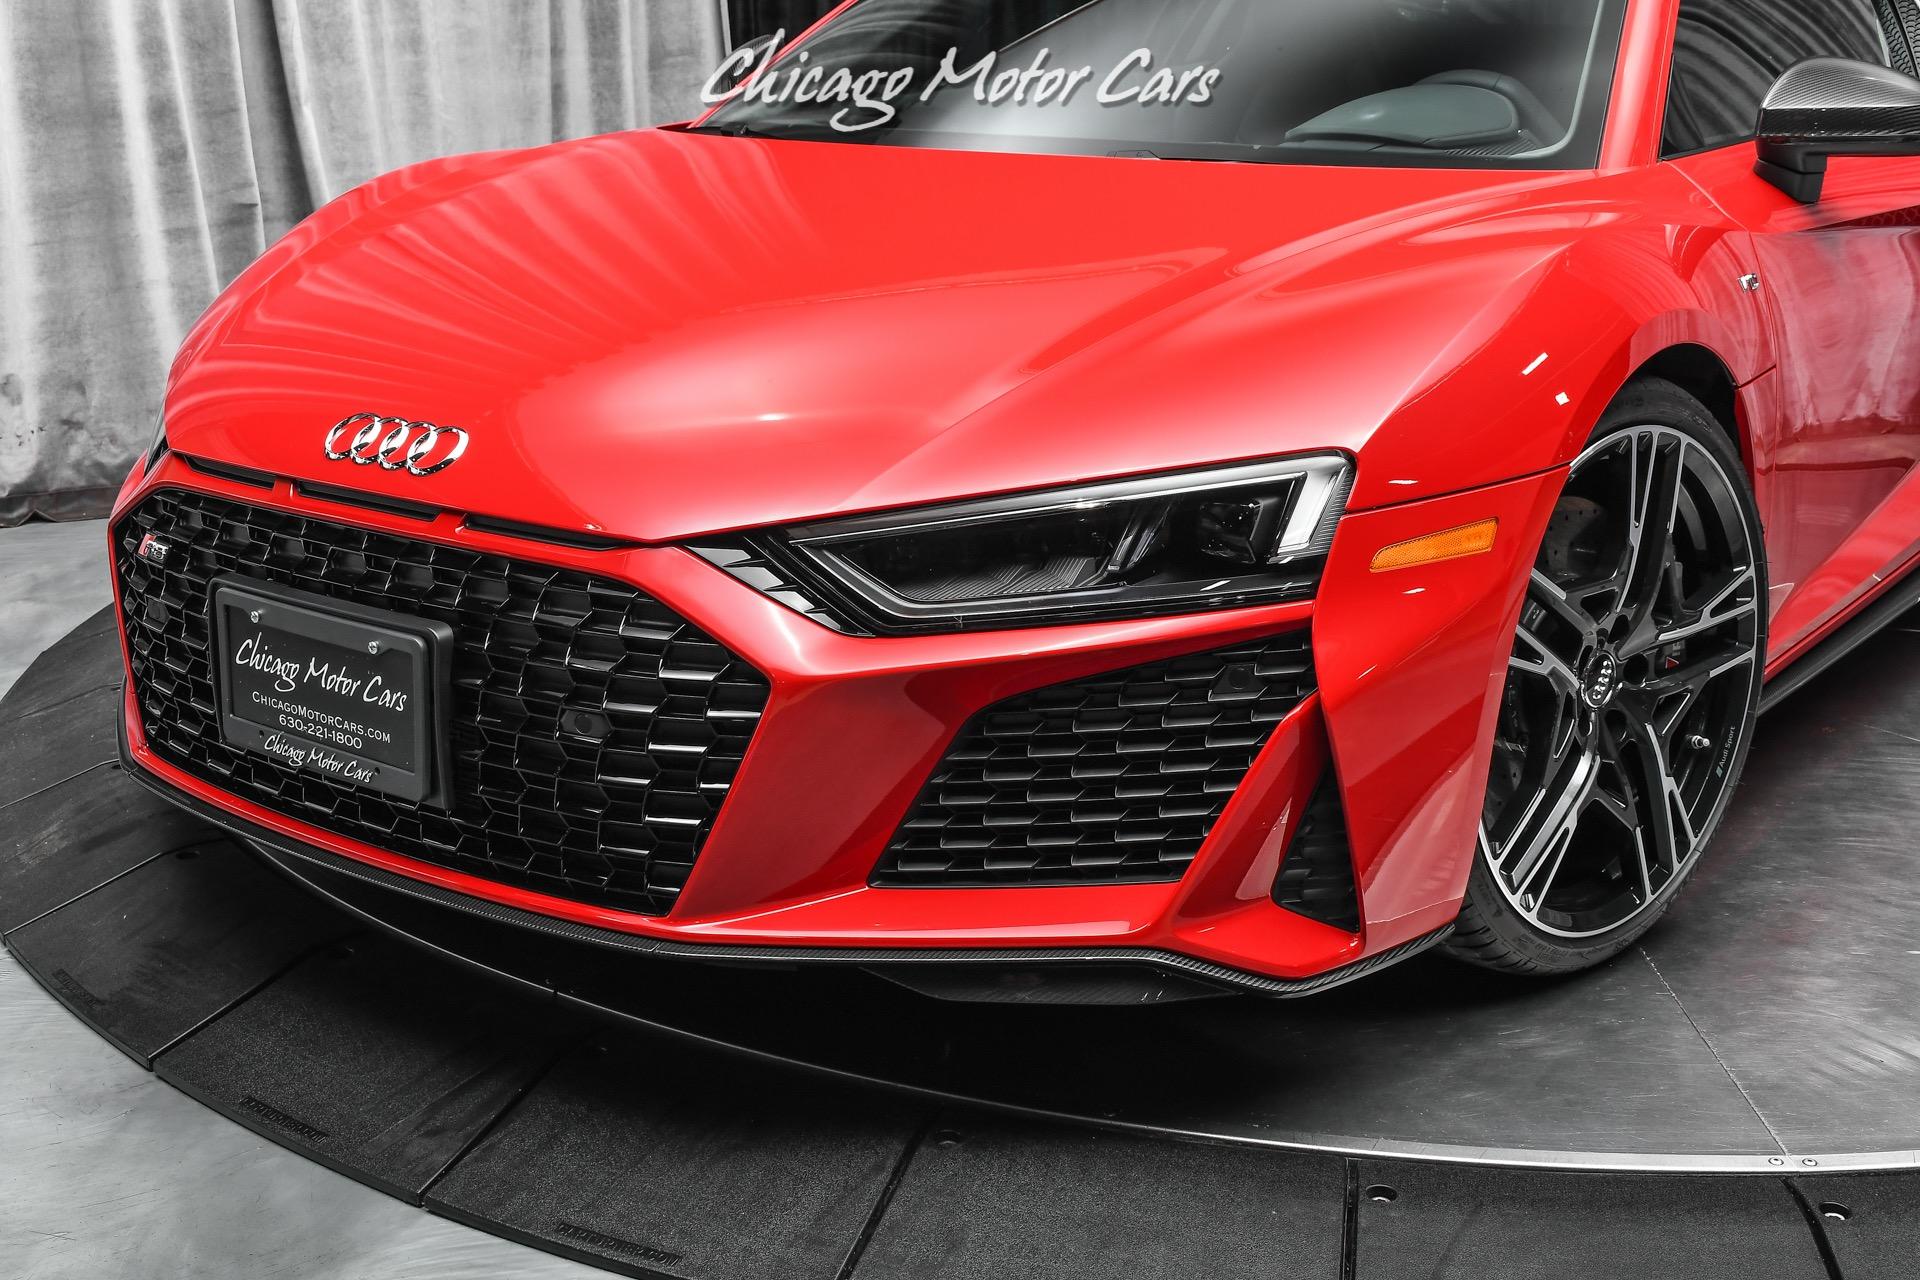 Used 2020 Audi R8 5.2 quattro V10 performance Audi Sport ...